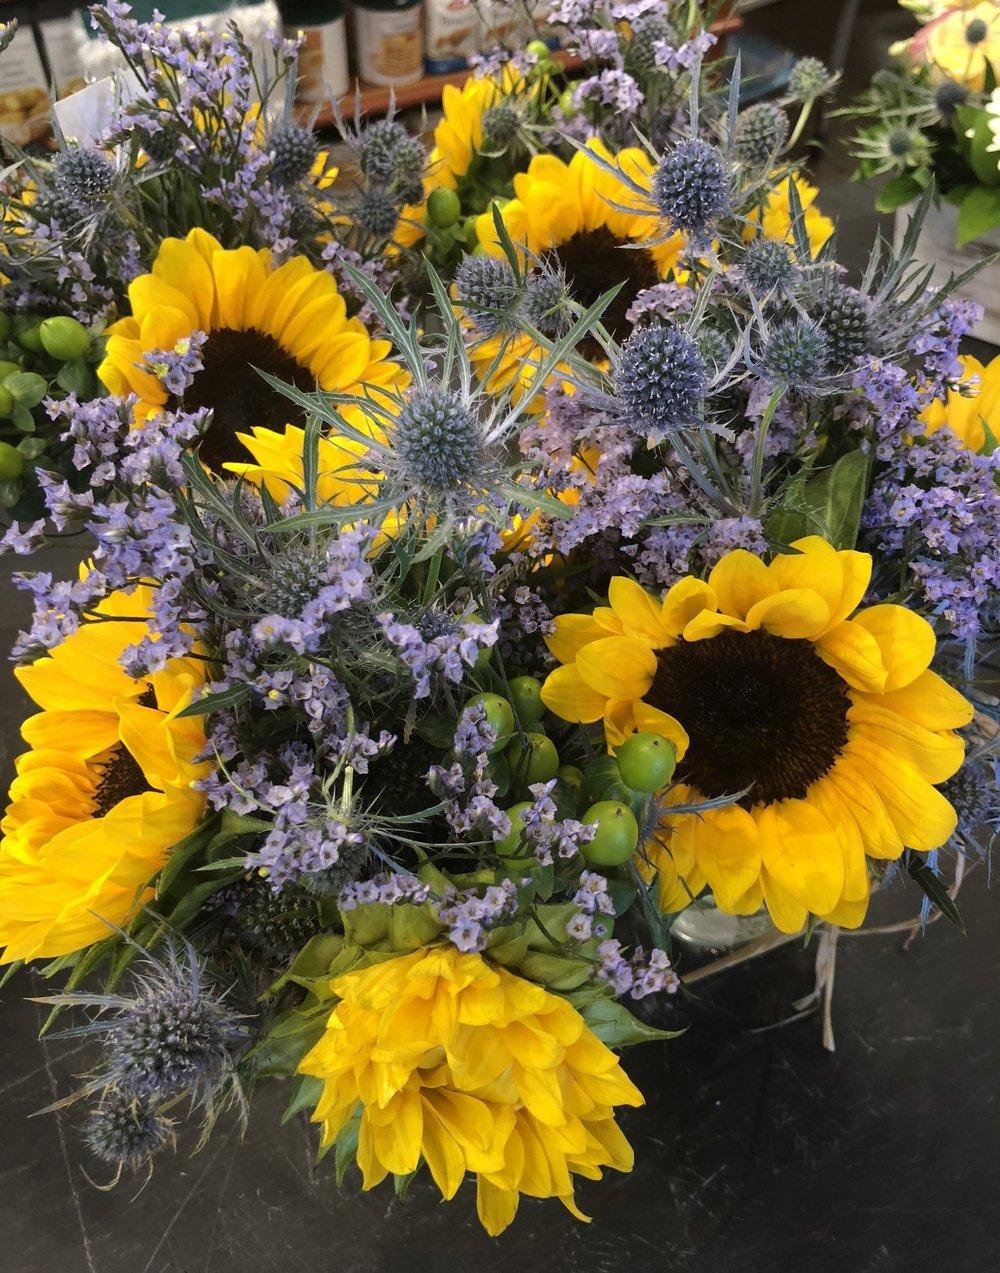 Russo's hand made floral arrangements of Sunflowers, Eryngium, Limonium and Green Hypericum berries